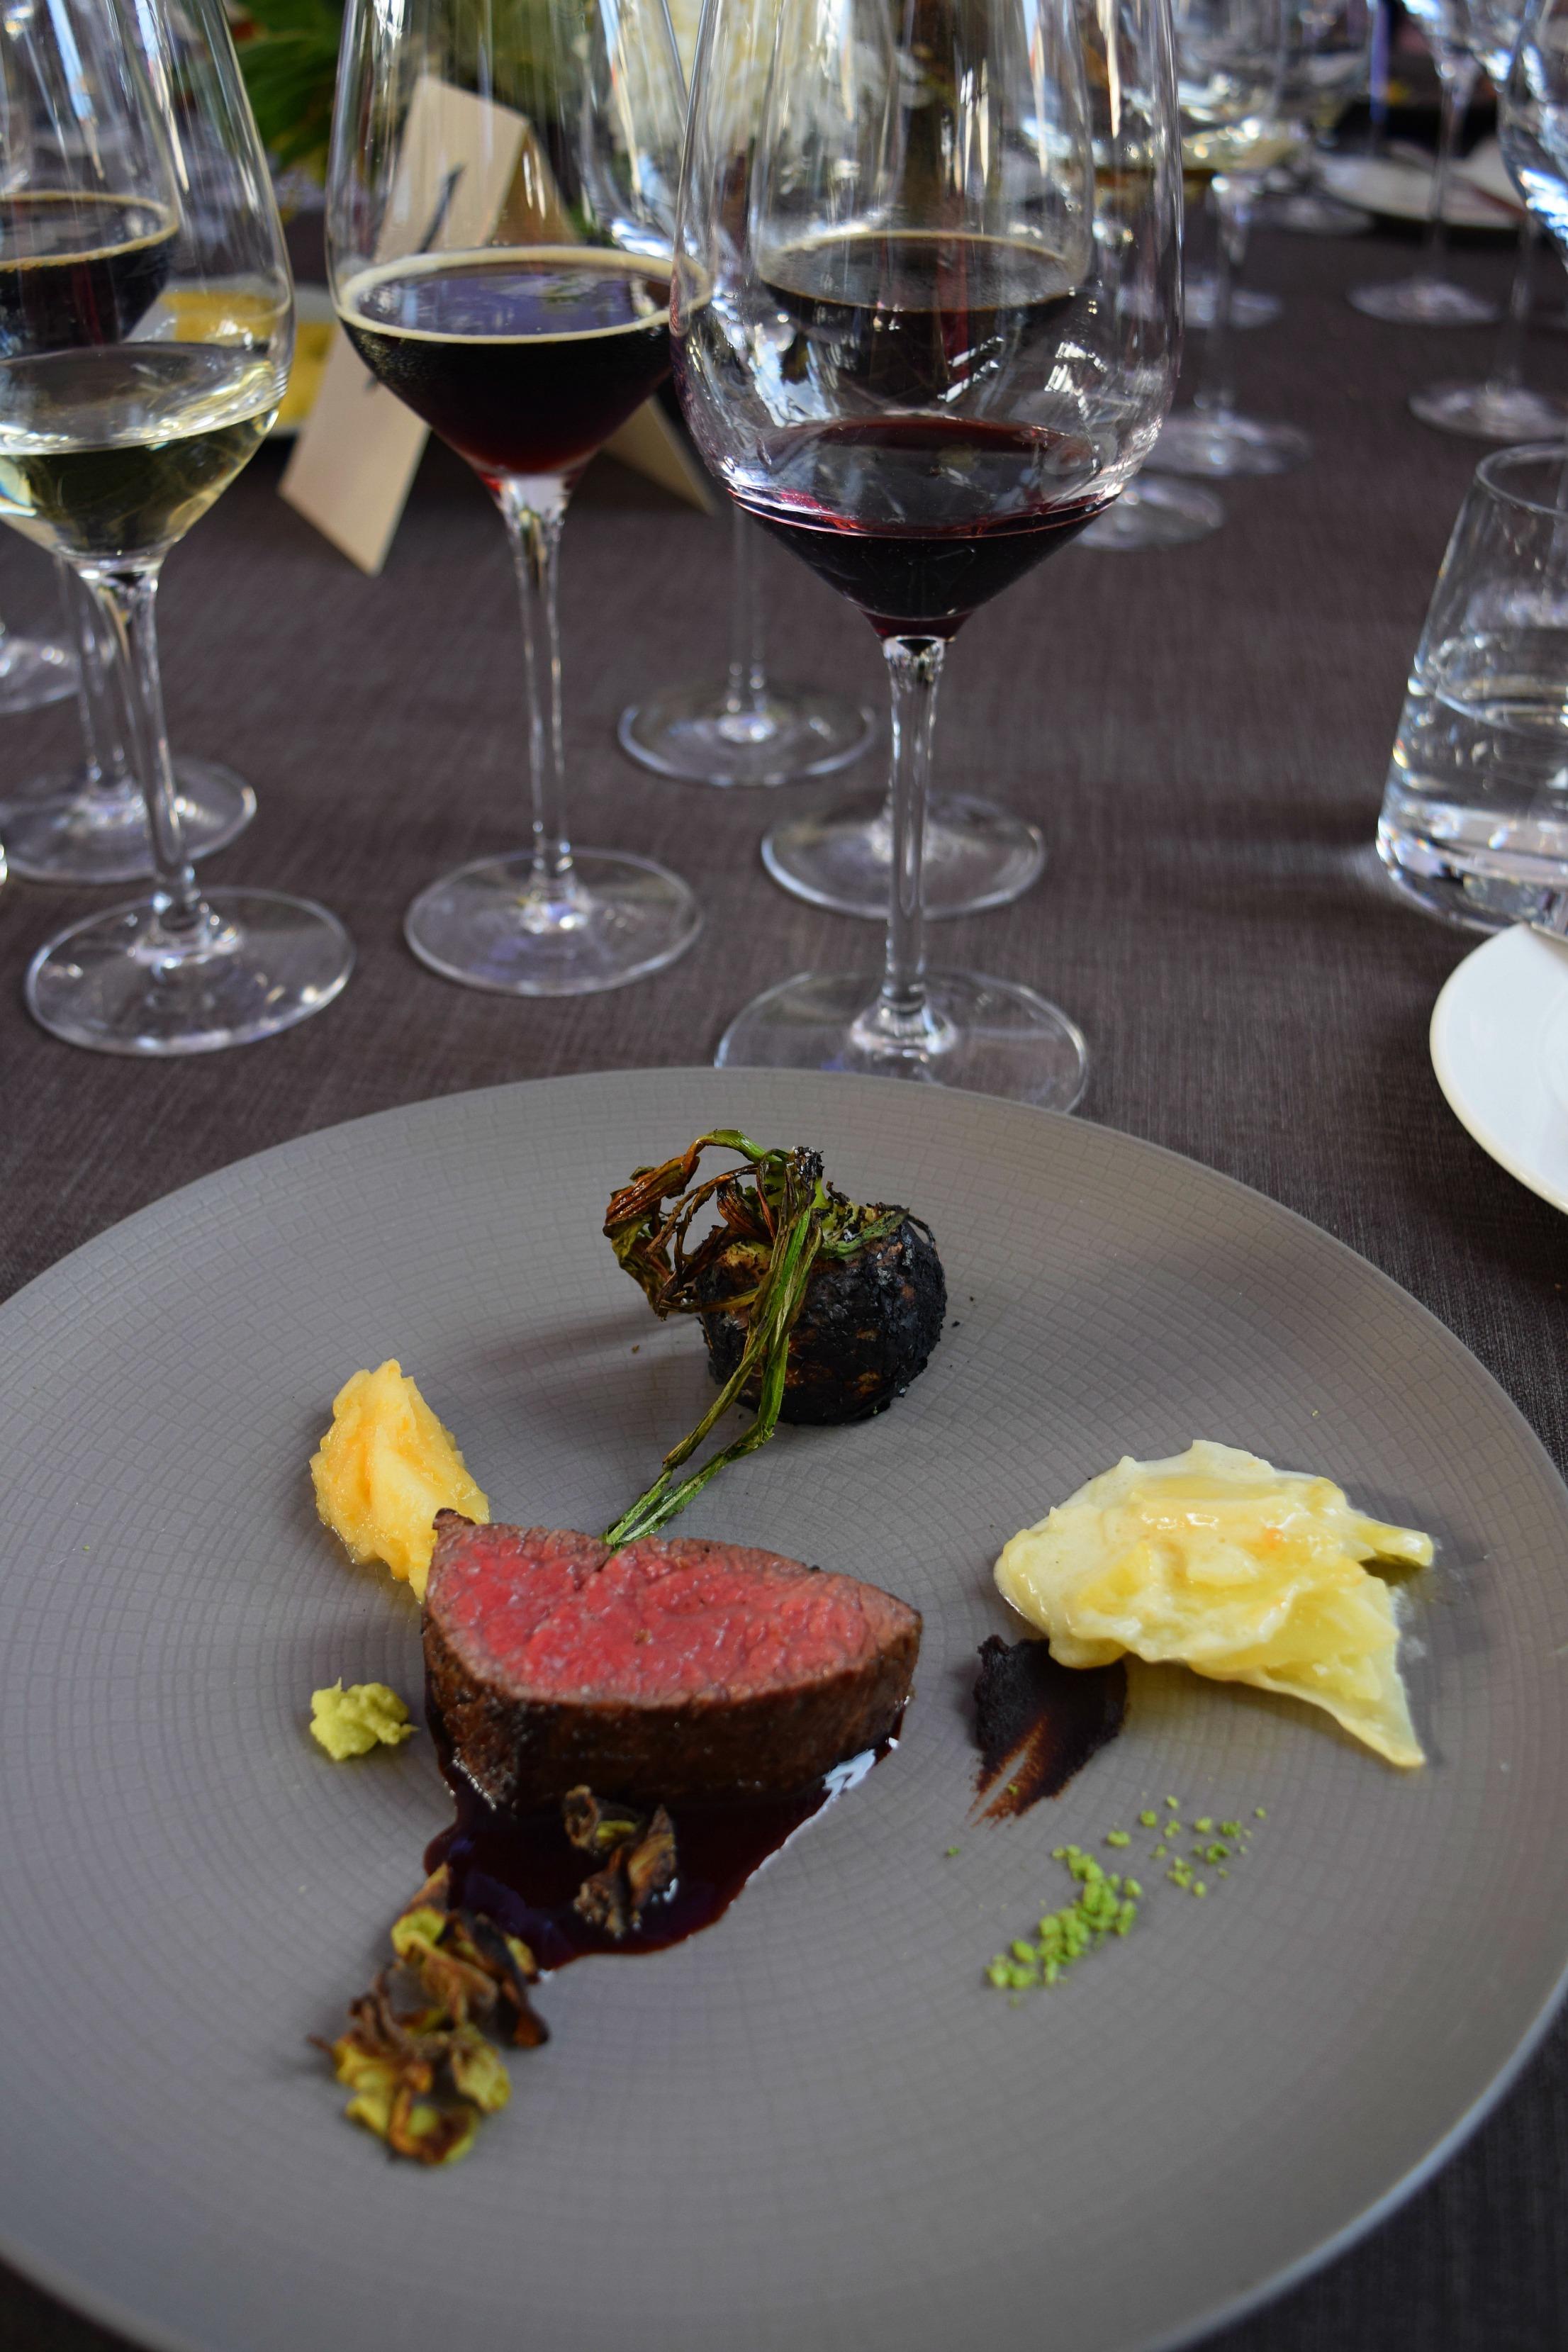 Restaurant Molière Sapporo Wagyu Relais Châteaux GourmetFest